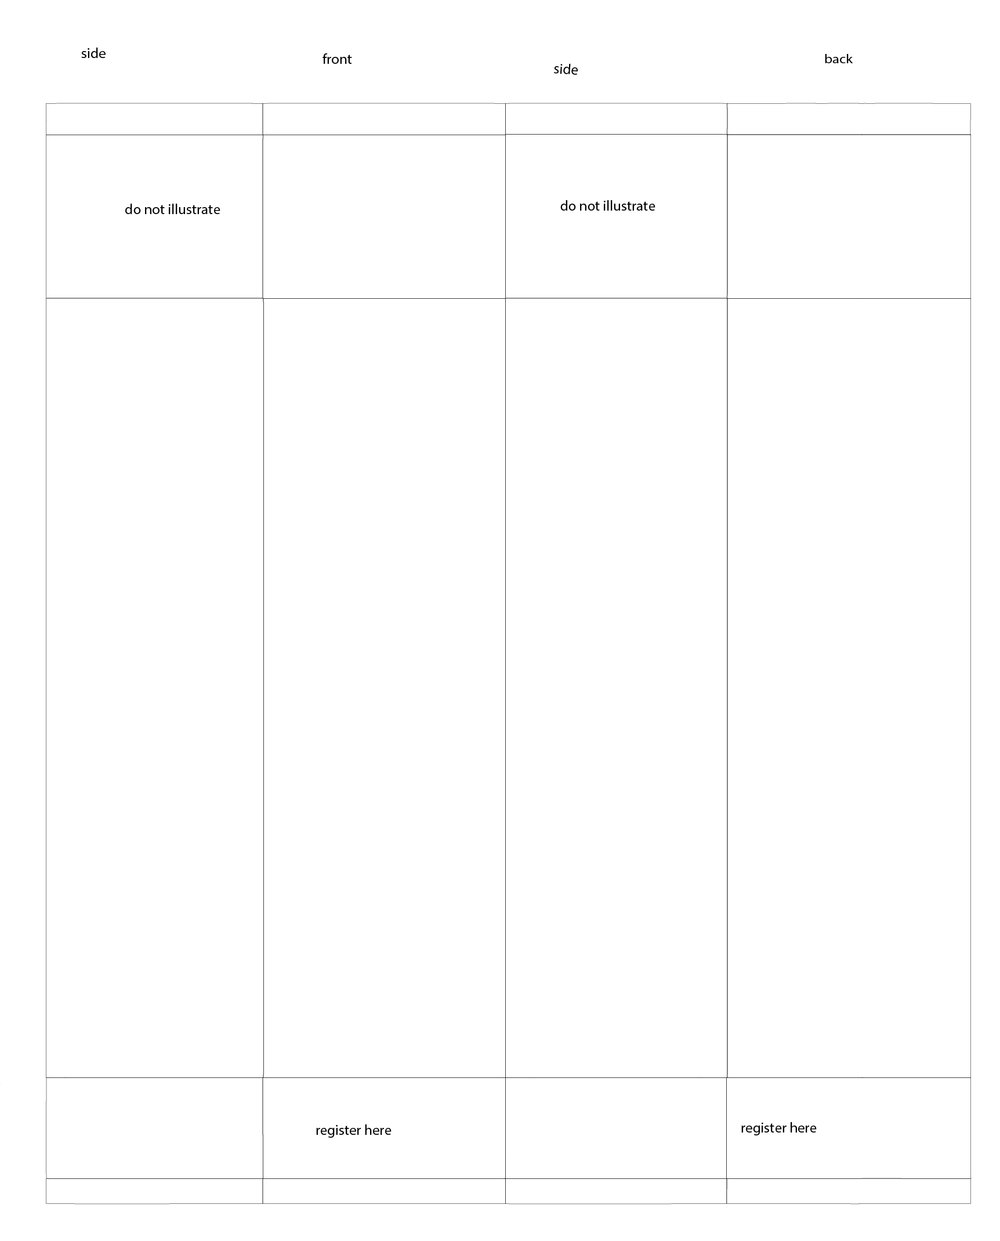 blanktetratemplatexample-01.jpg